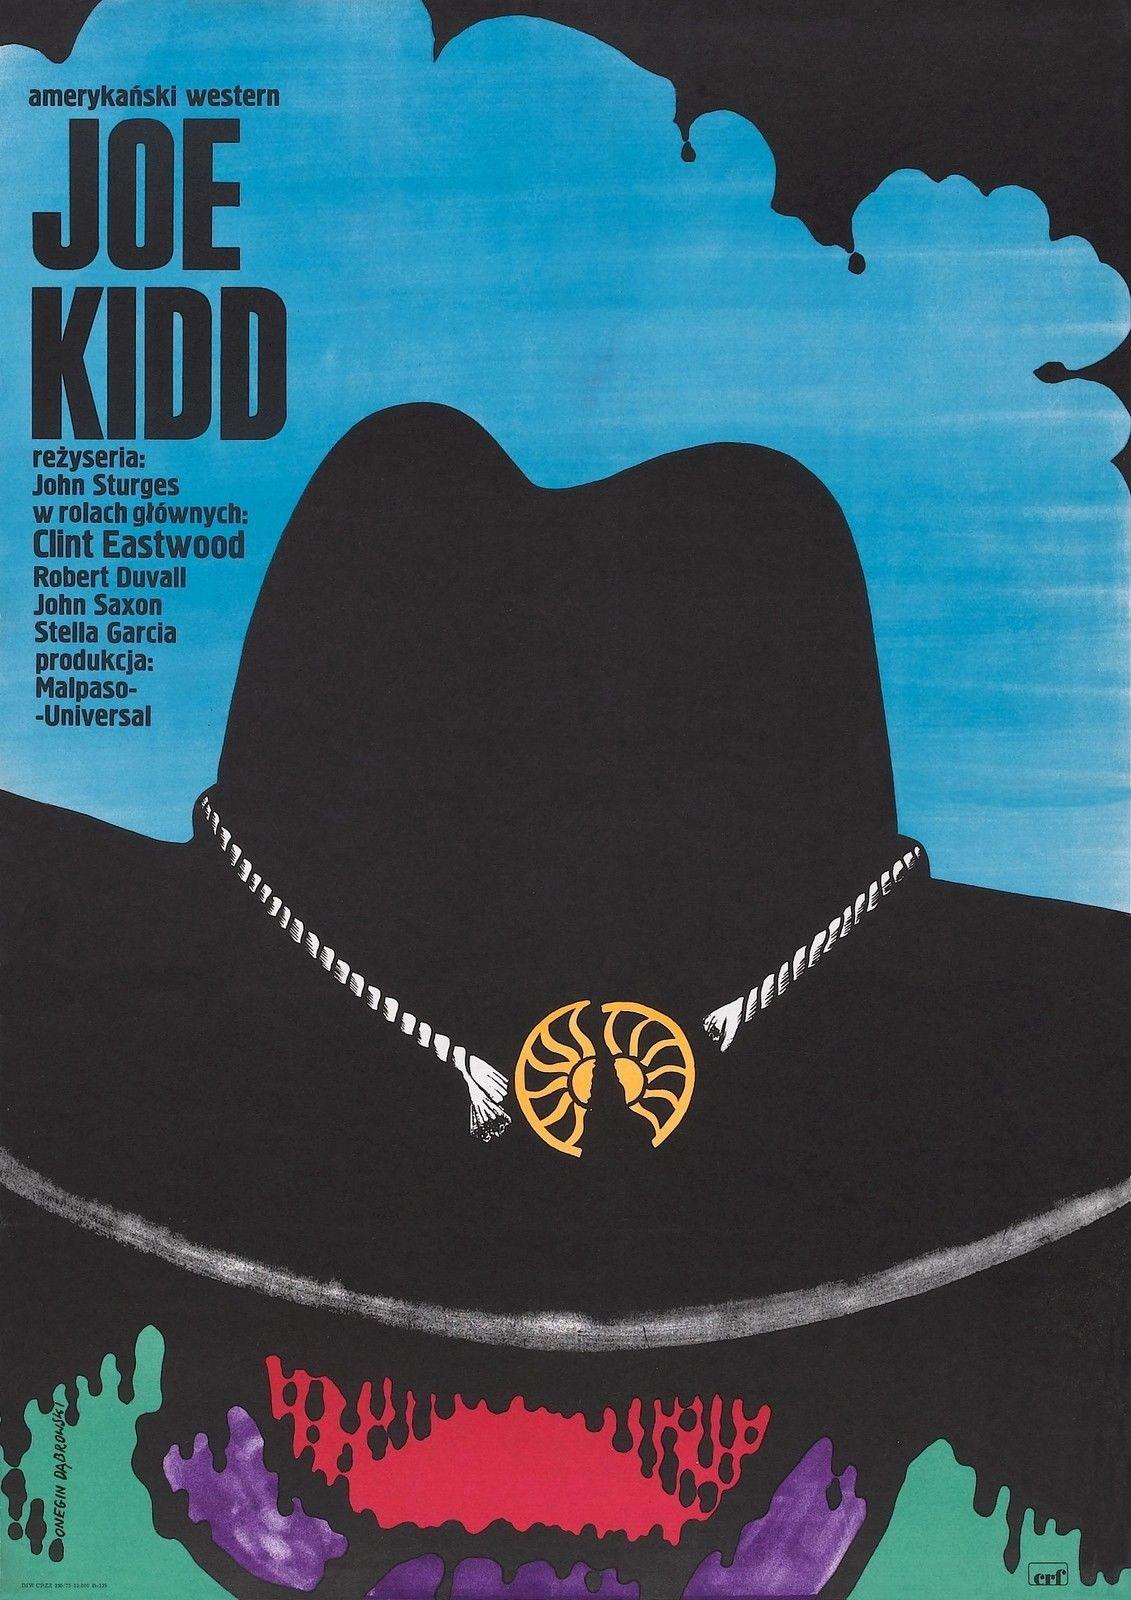 74300-JOE-KIDD-Movie-RARE-Clint-Eastwood-Western-Wall-Print-Poster-Affiche